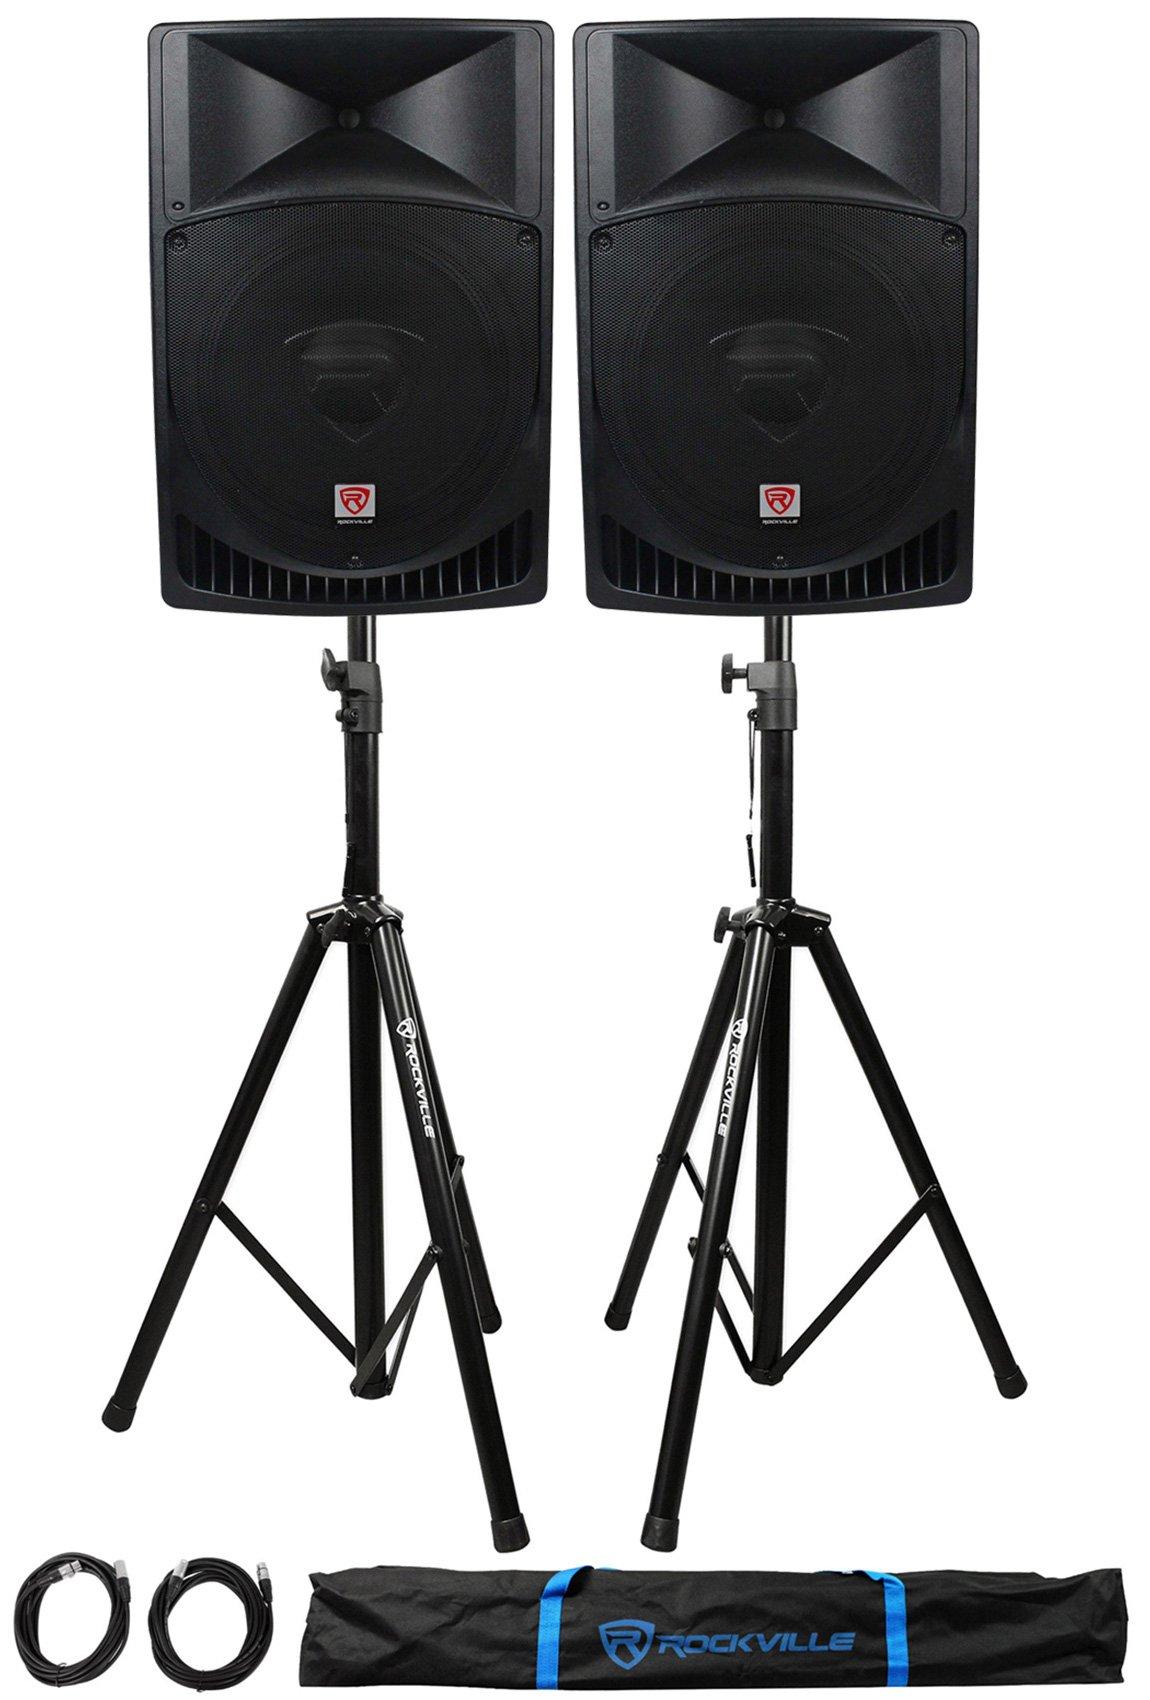 Rockville RPG15 15'' Professional Powered Active 1,000 Watt 2-Way DJ PA Speaker